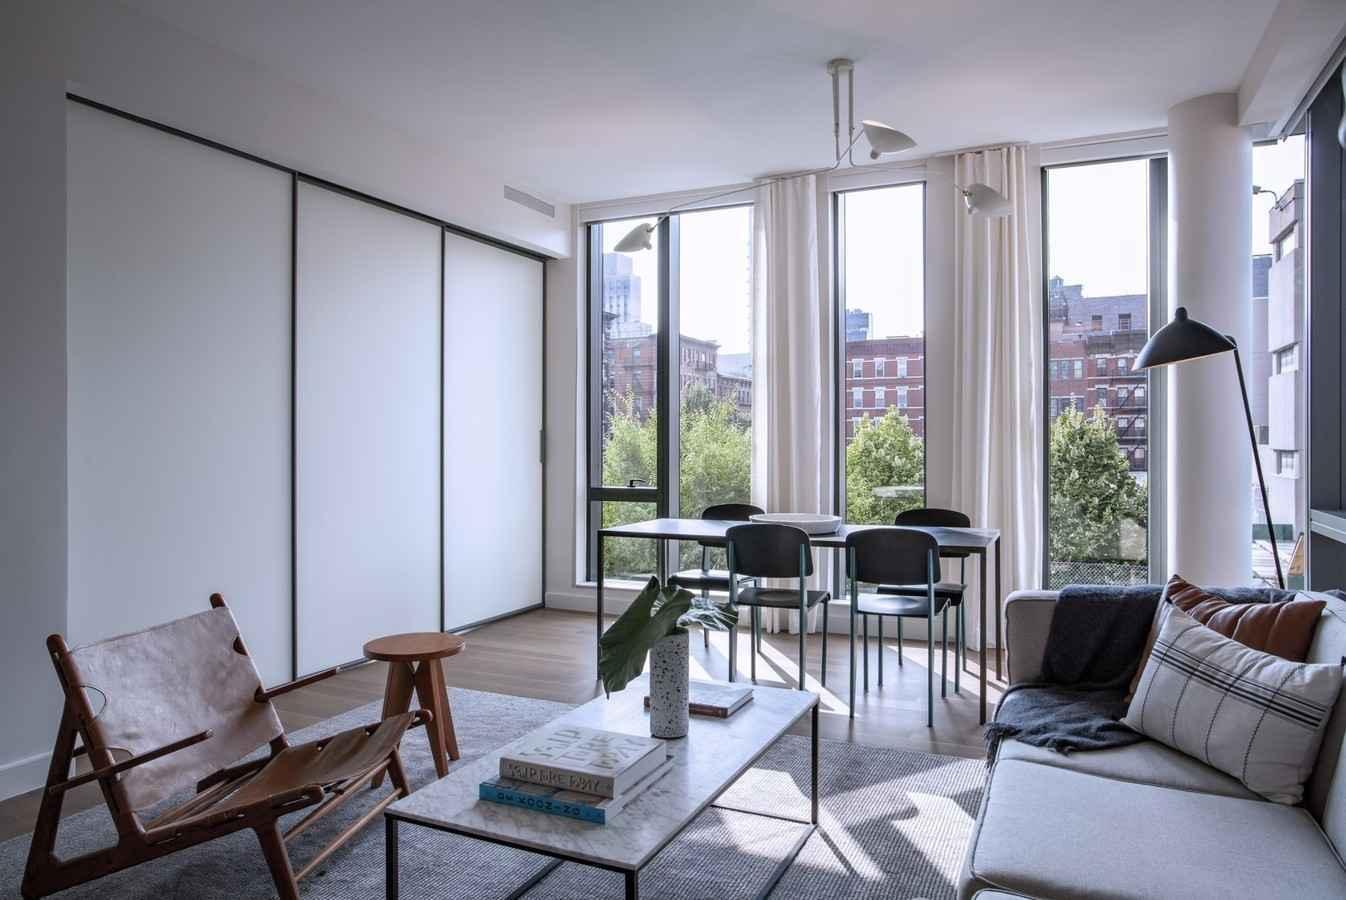 Apartment for sale at 150 Rivington Street, Apt 3-A